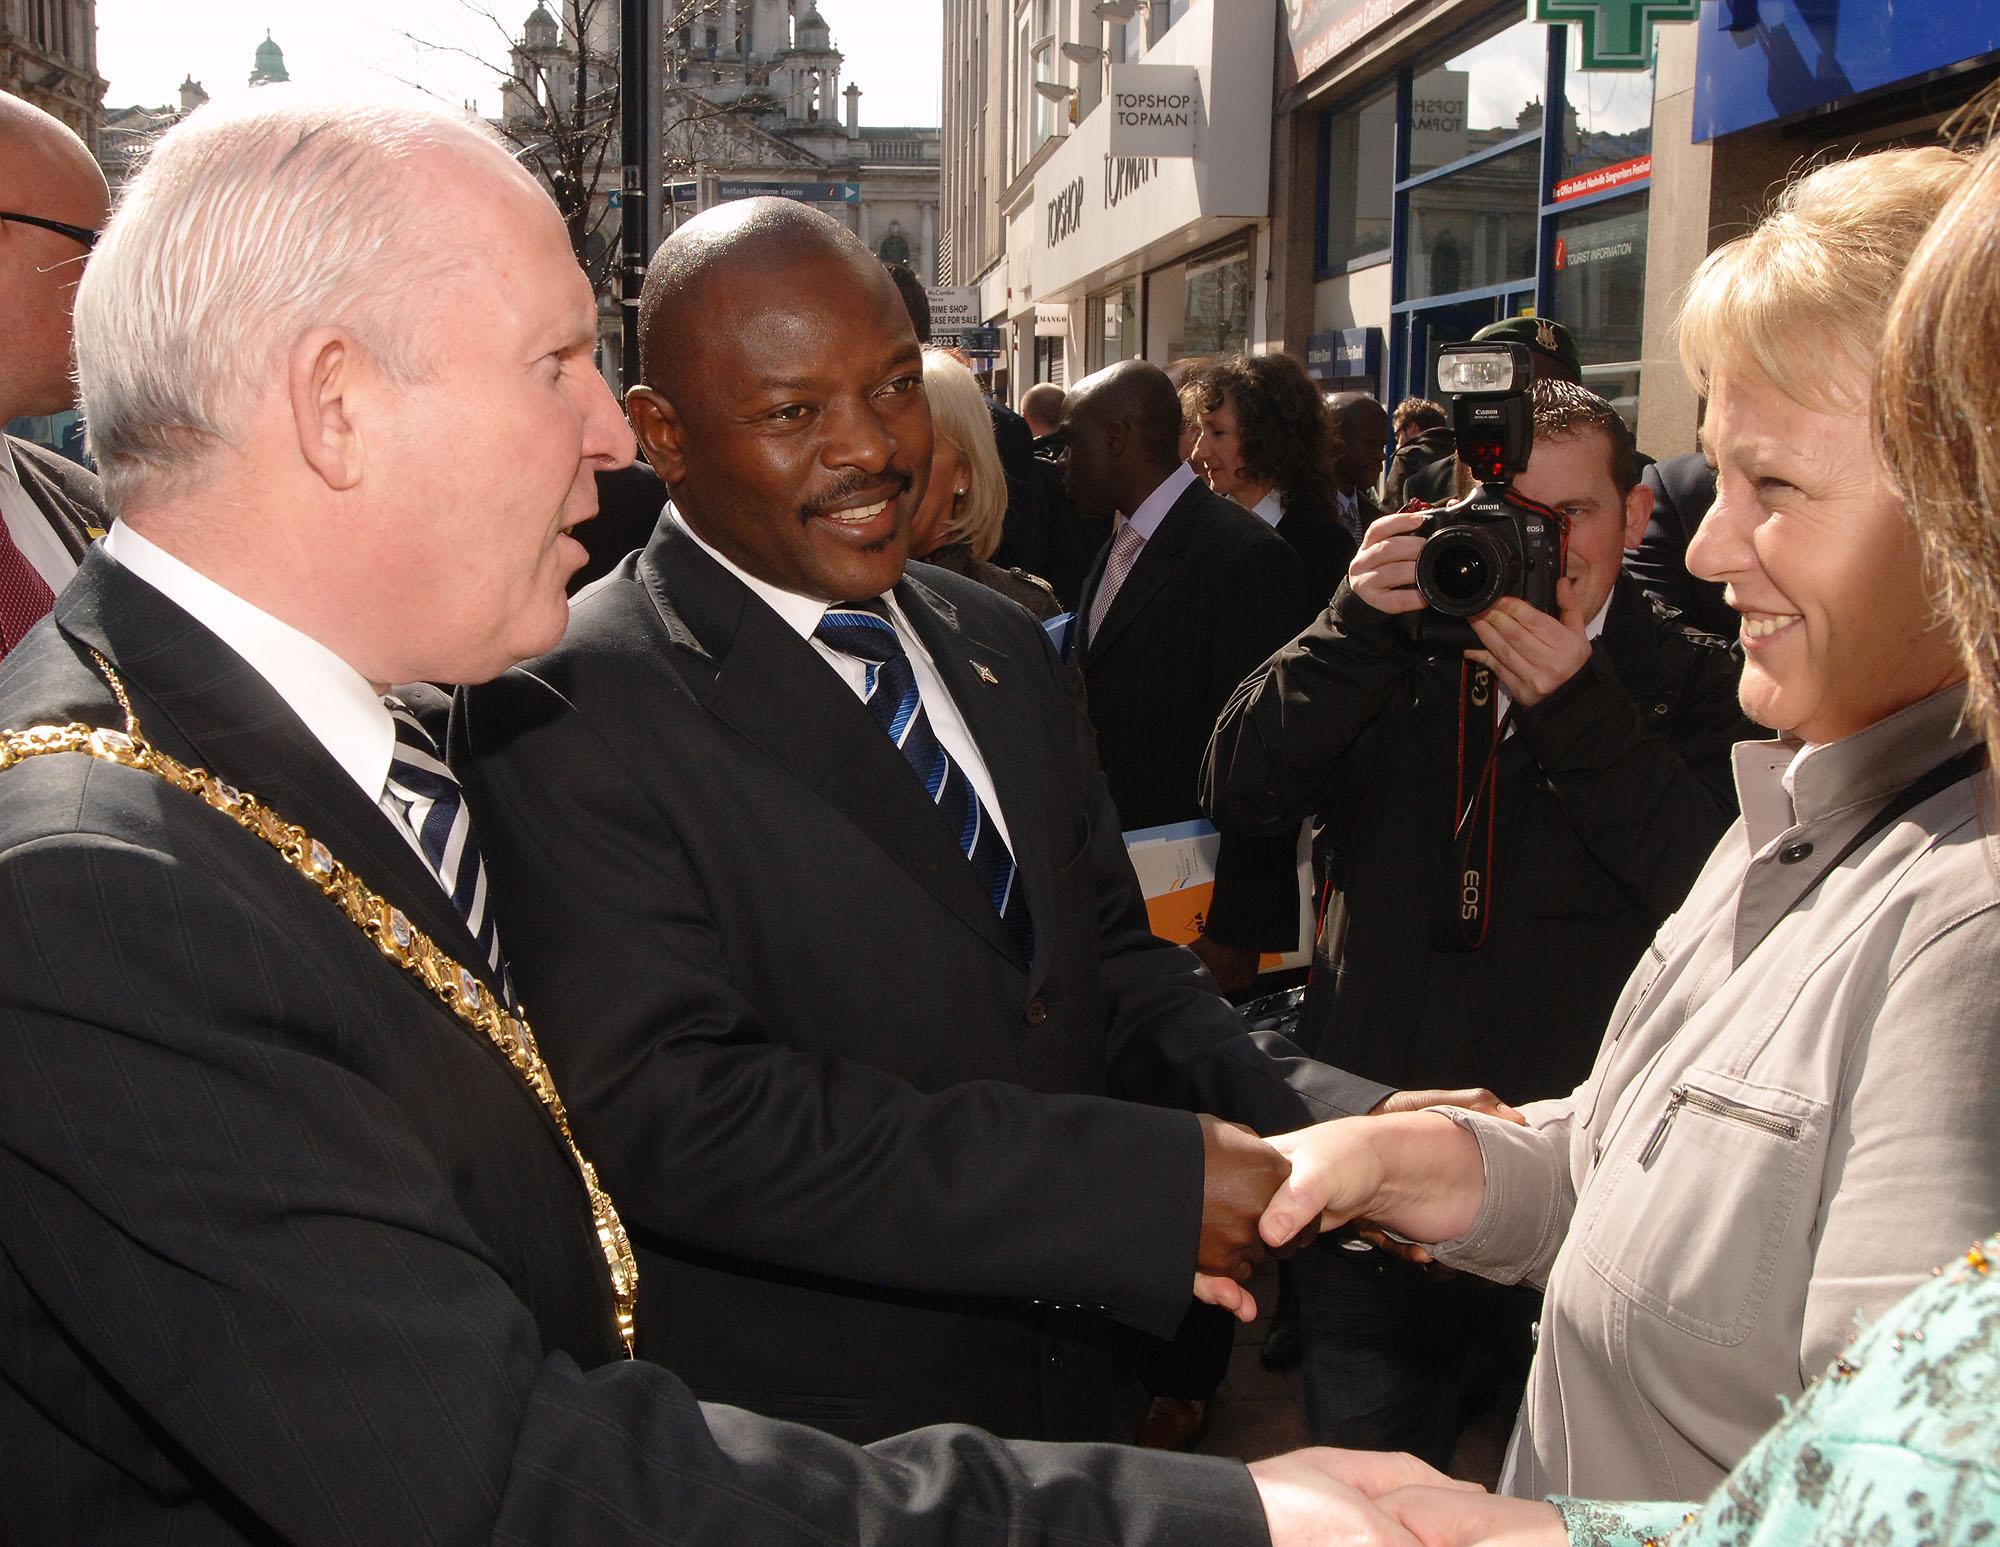 Presient of Burundi visits Northern Ireland